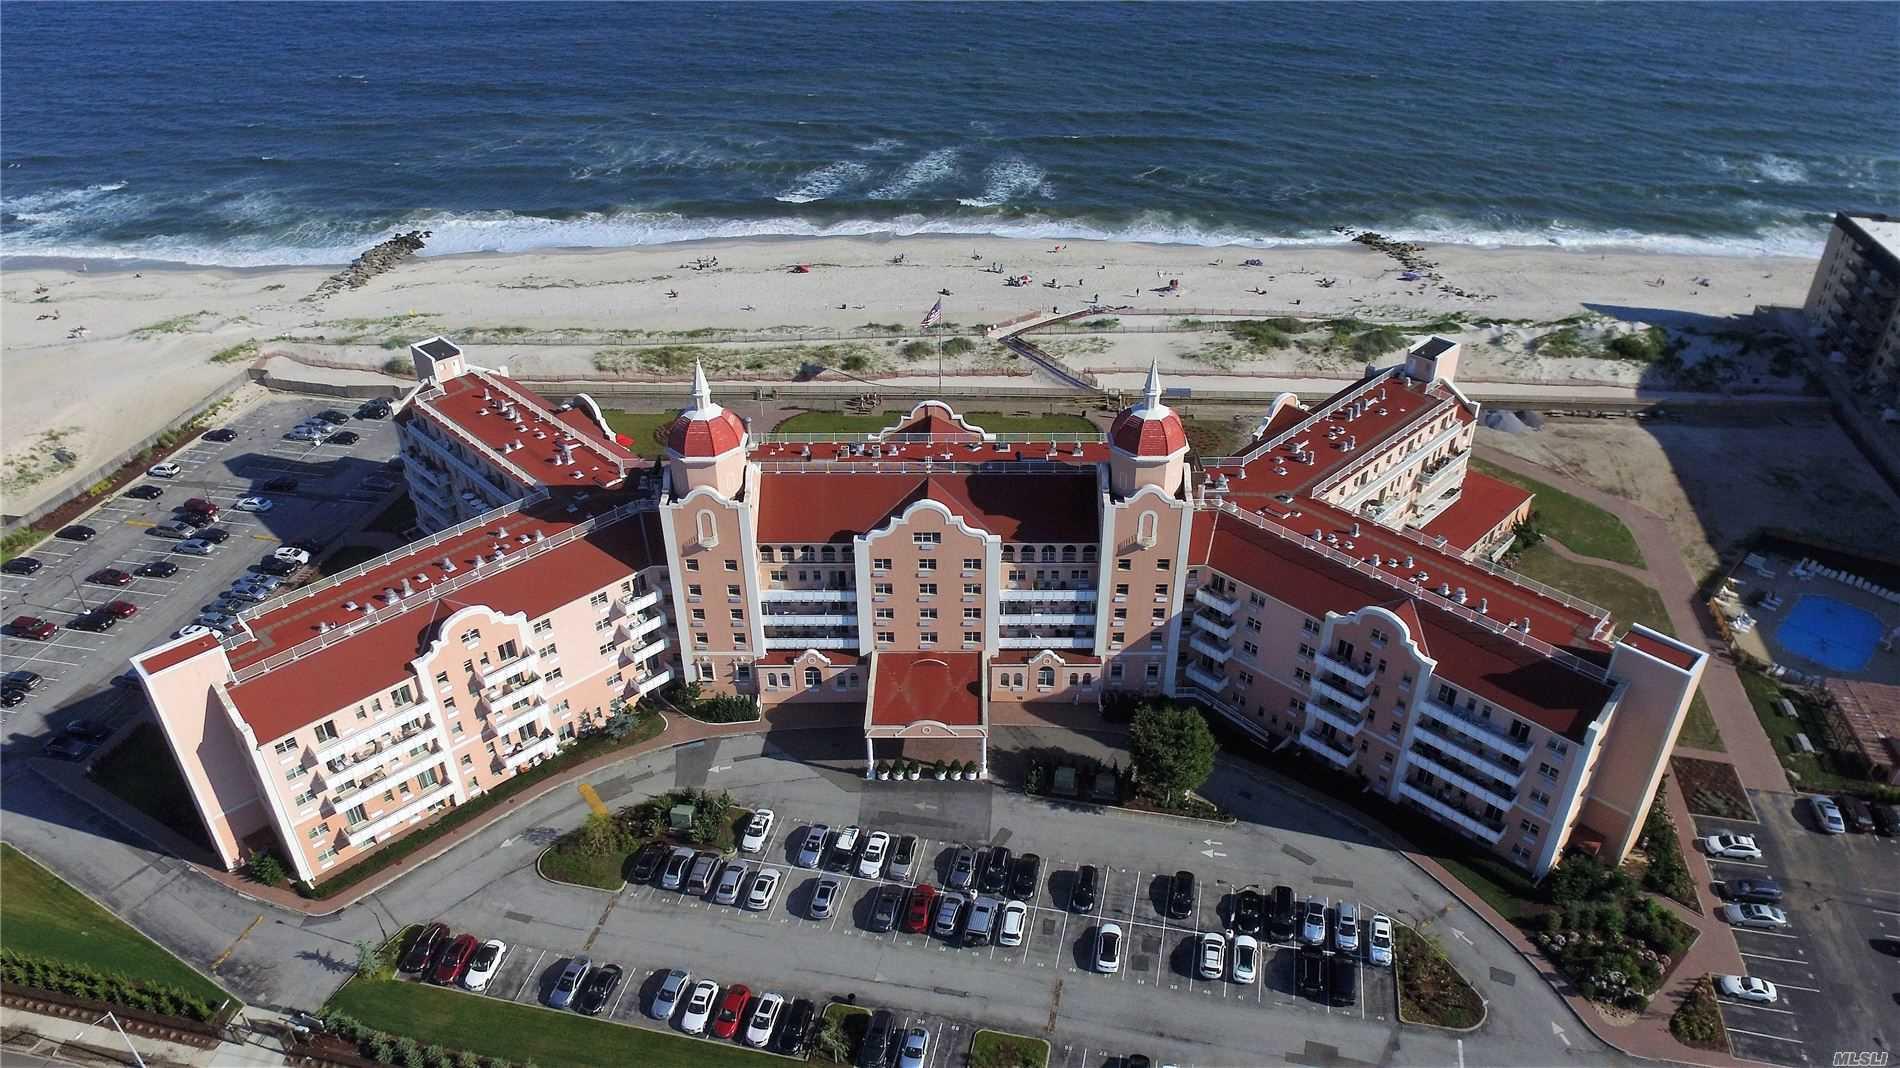 Property for sale at 2 Richmond Road # 3J, Lido Beach NY 11561, Lido Beach,  New York 11561